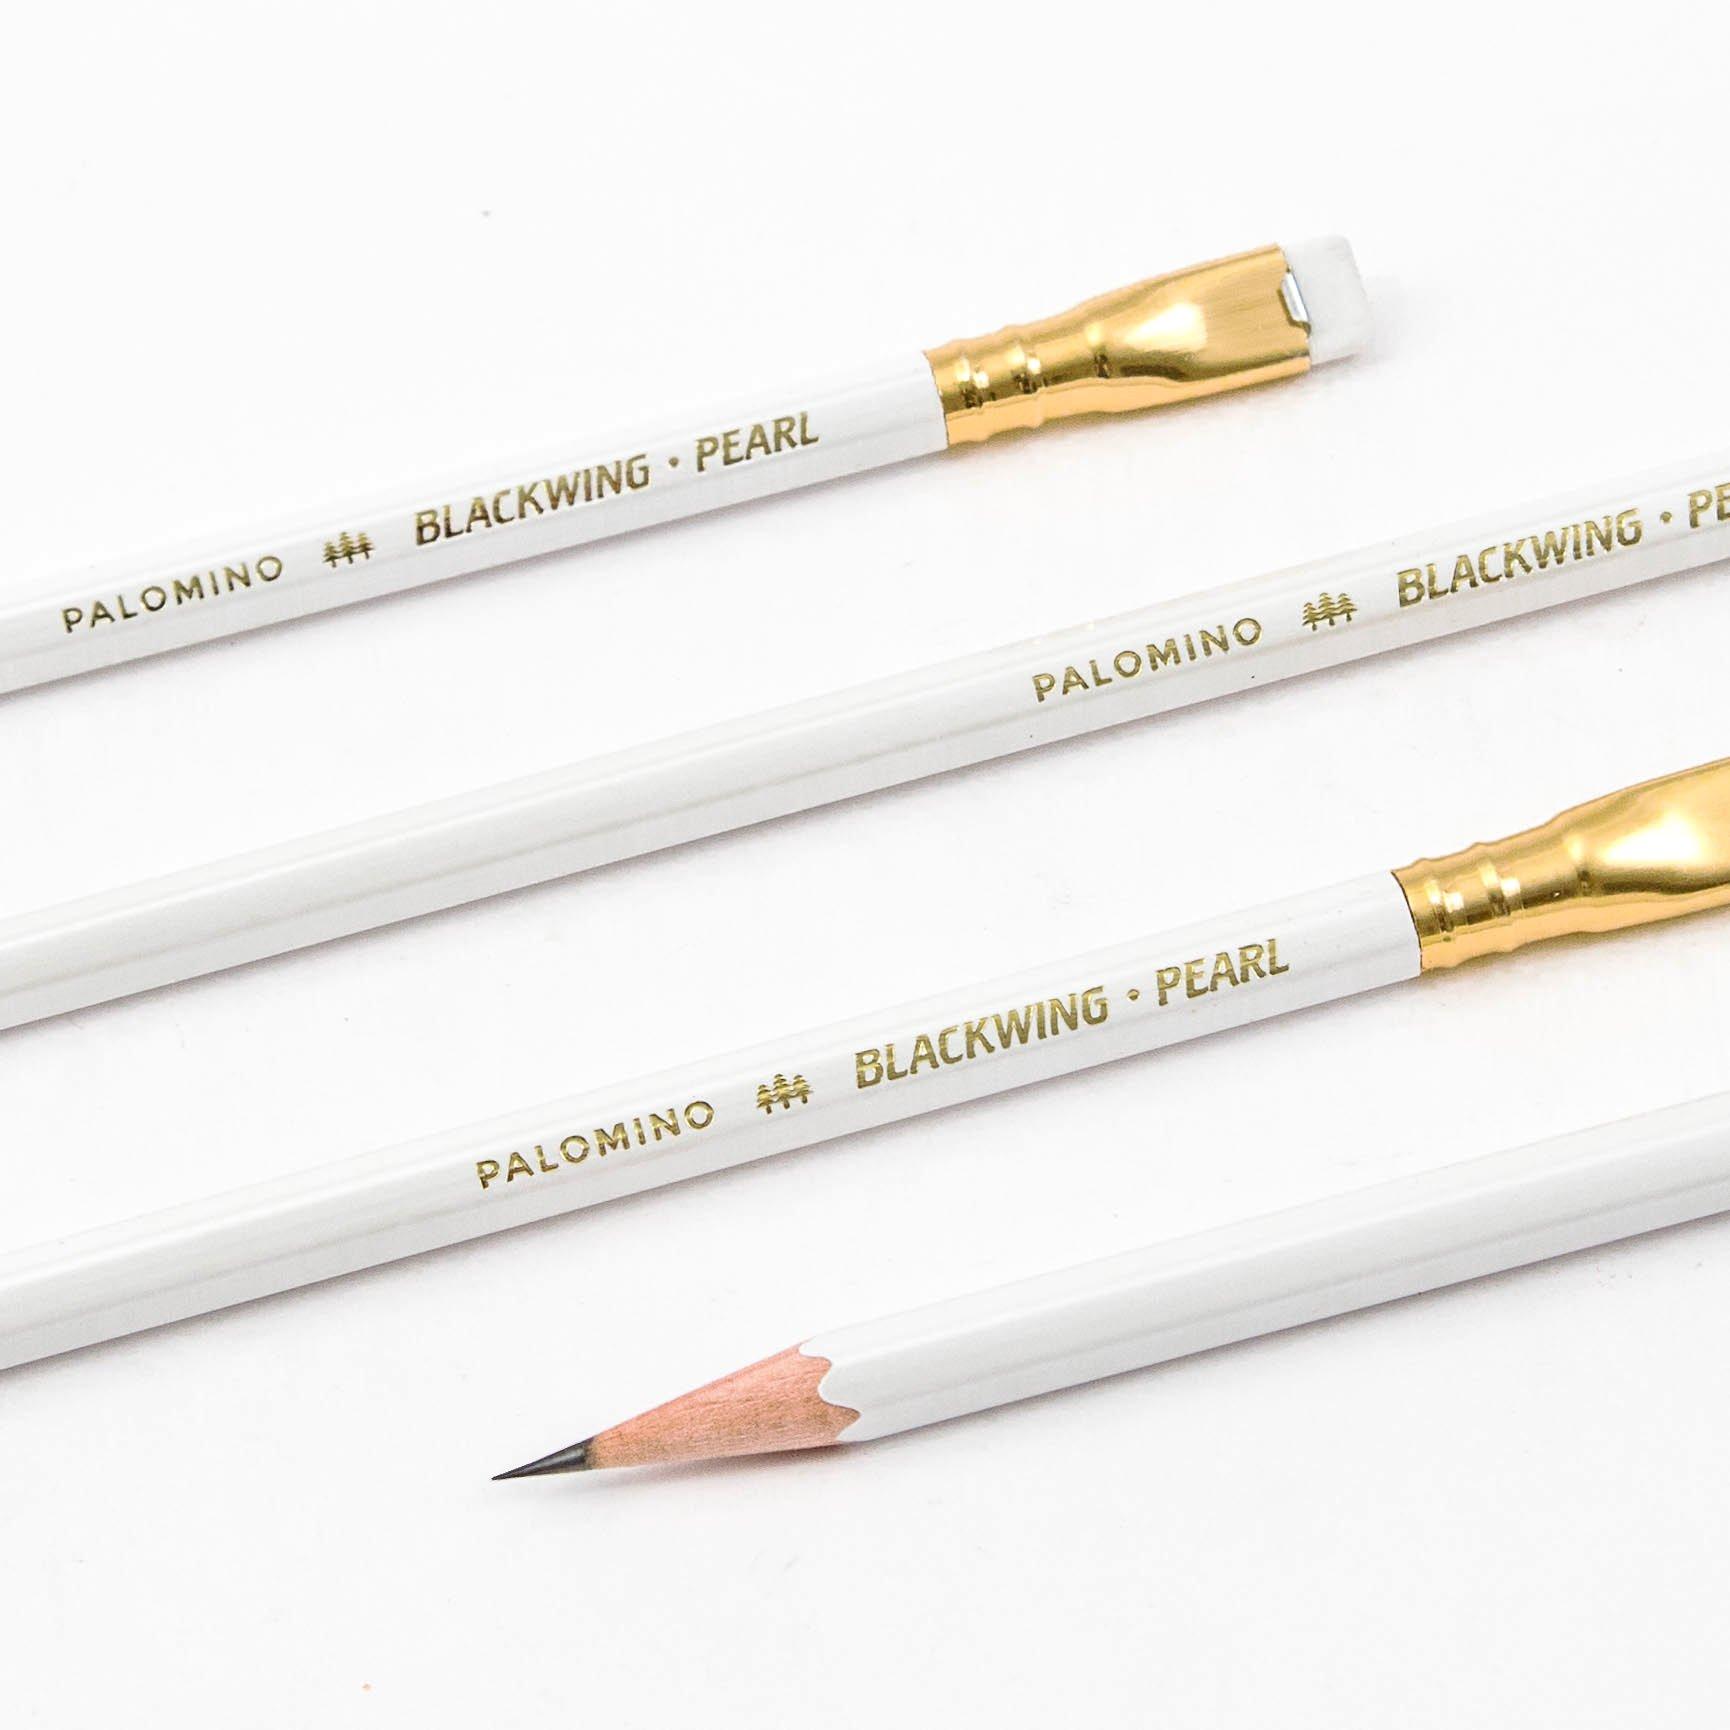 Palomino Blackwing Pearl Pencils - 12 Pack by Blackwing